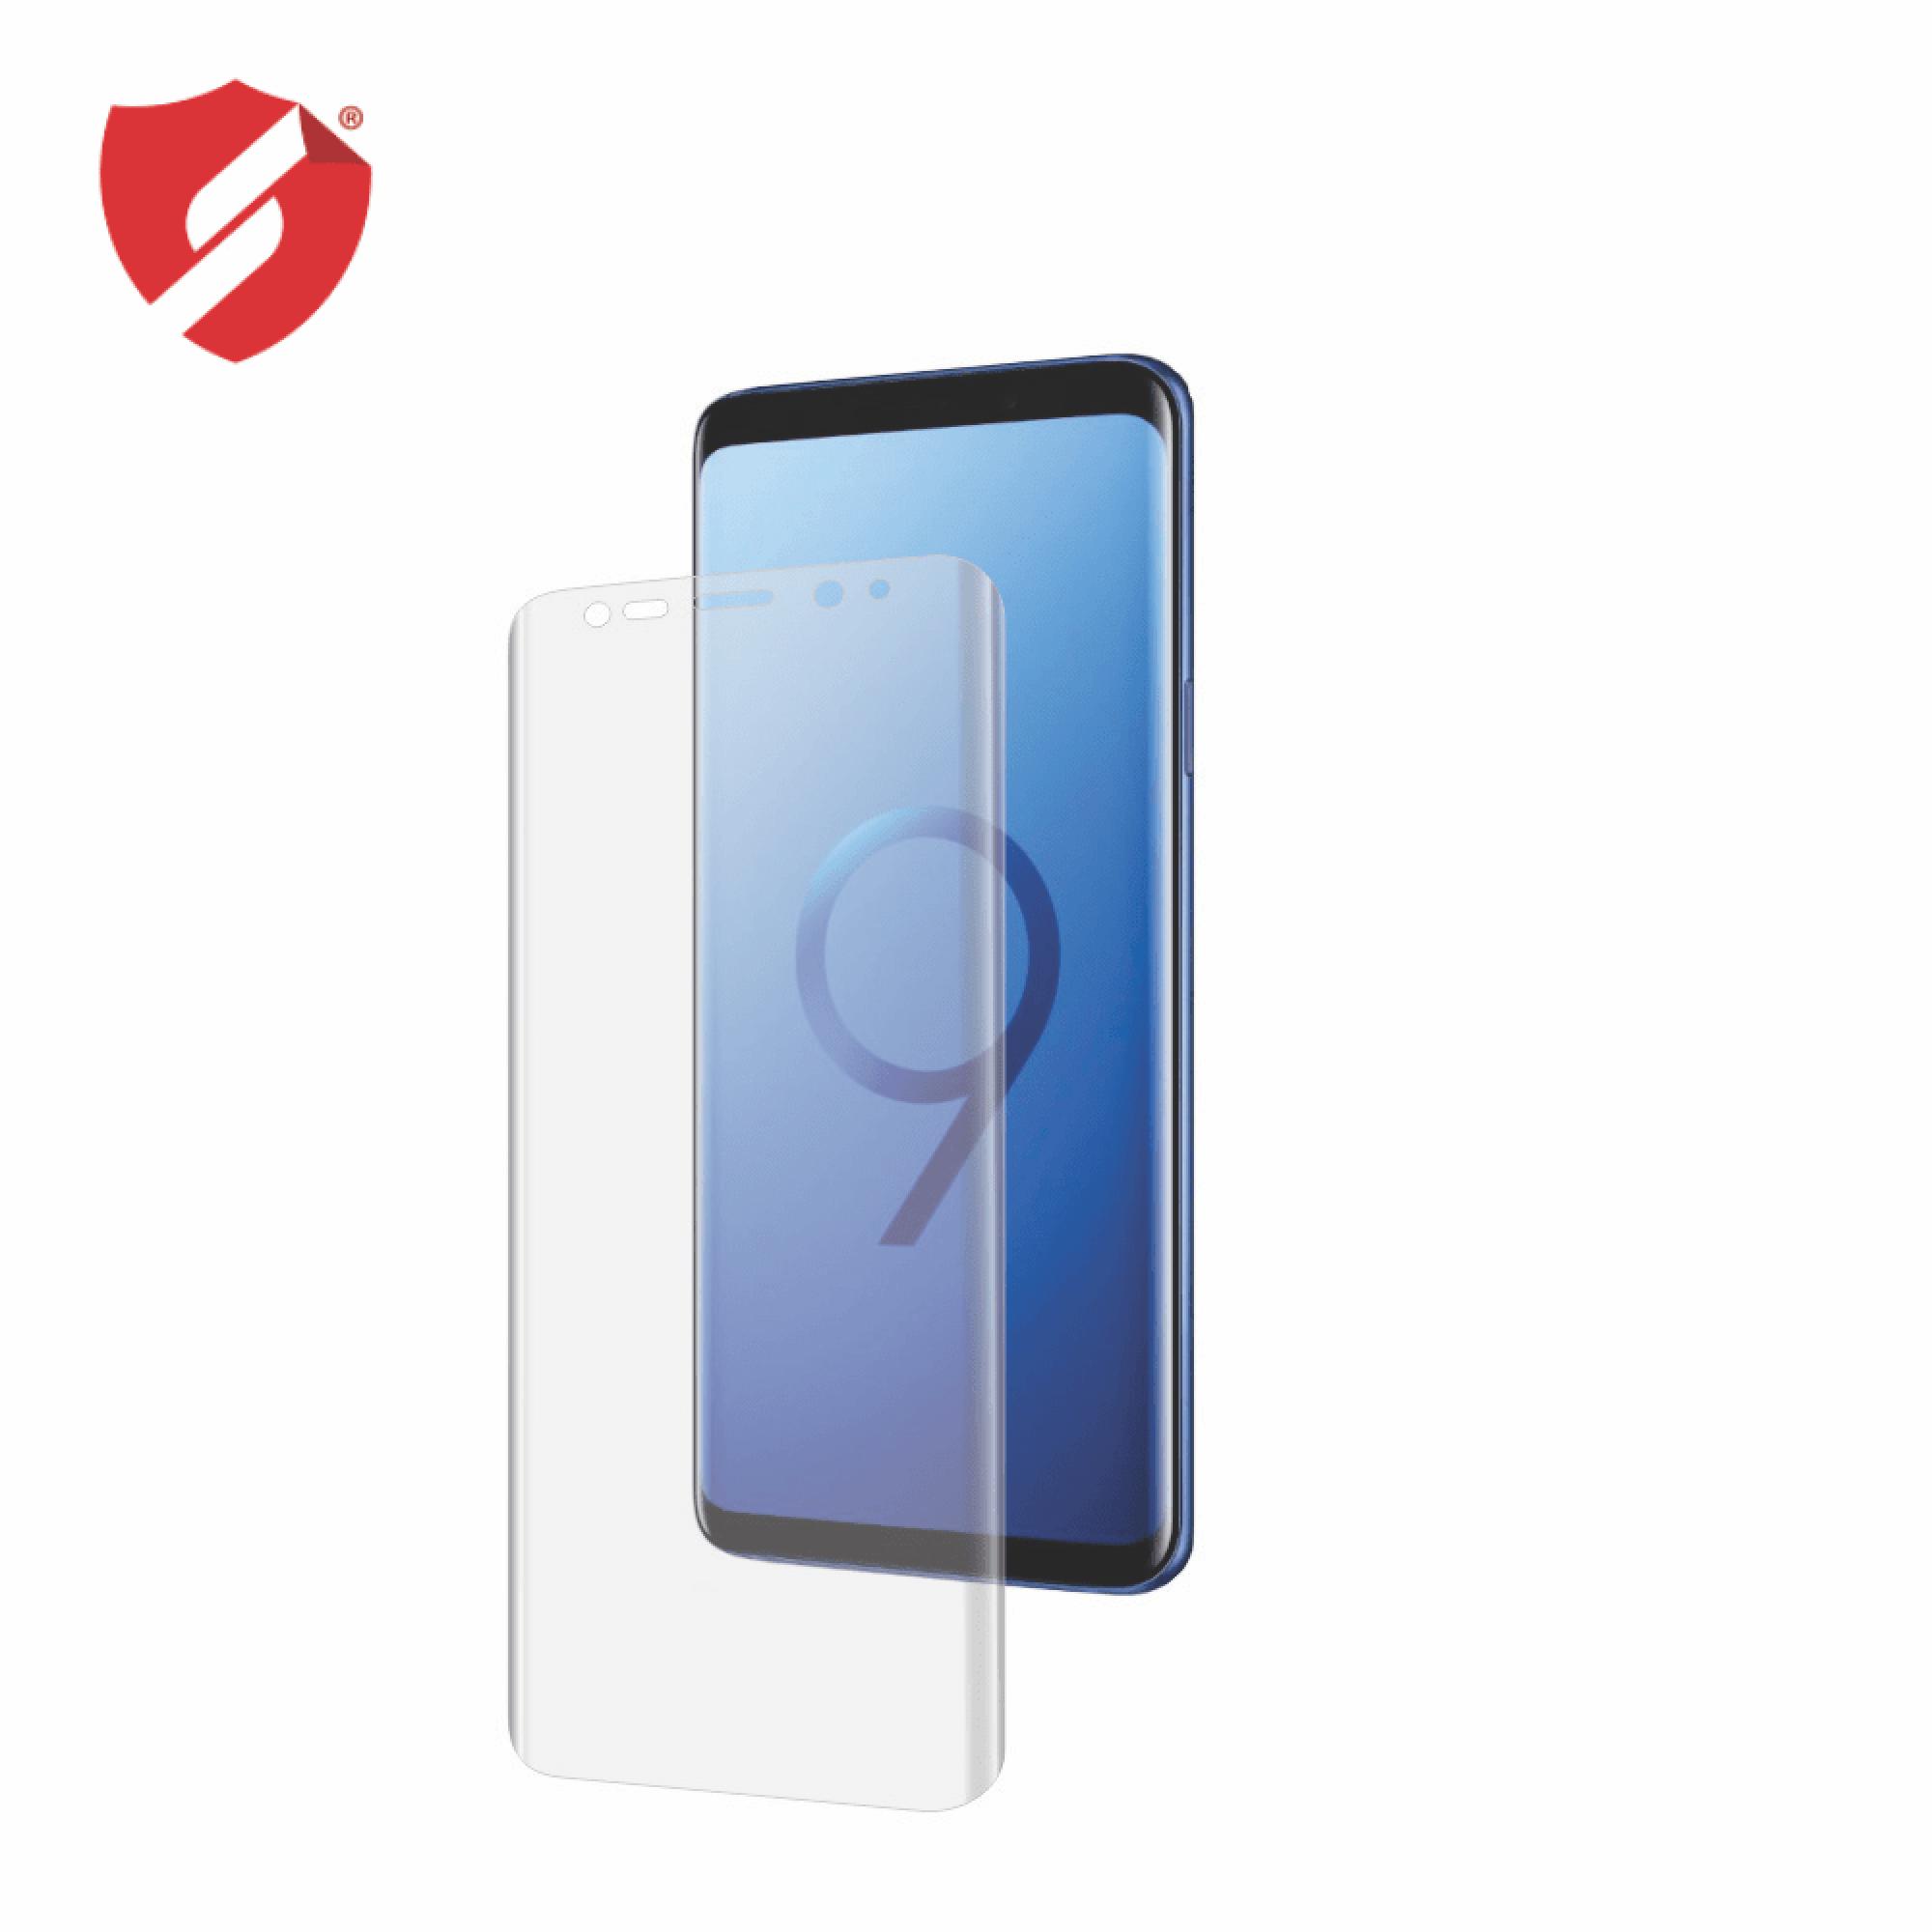 Folie de protectie Smart Protection Samsung Galaxy S9 Plus compatibila cu carcasa Ringke Slim - doar-display imagine